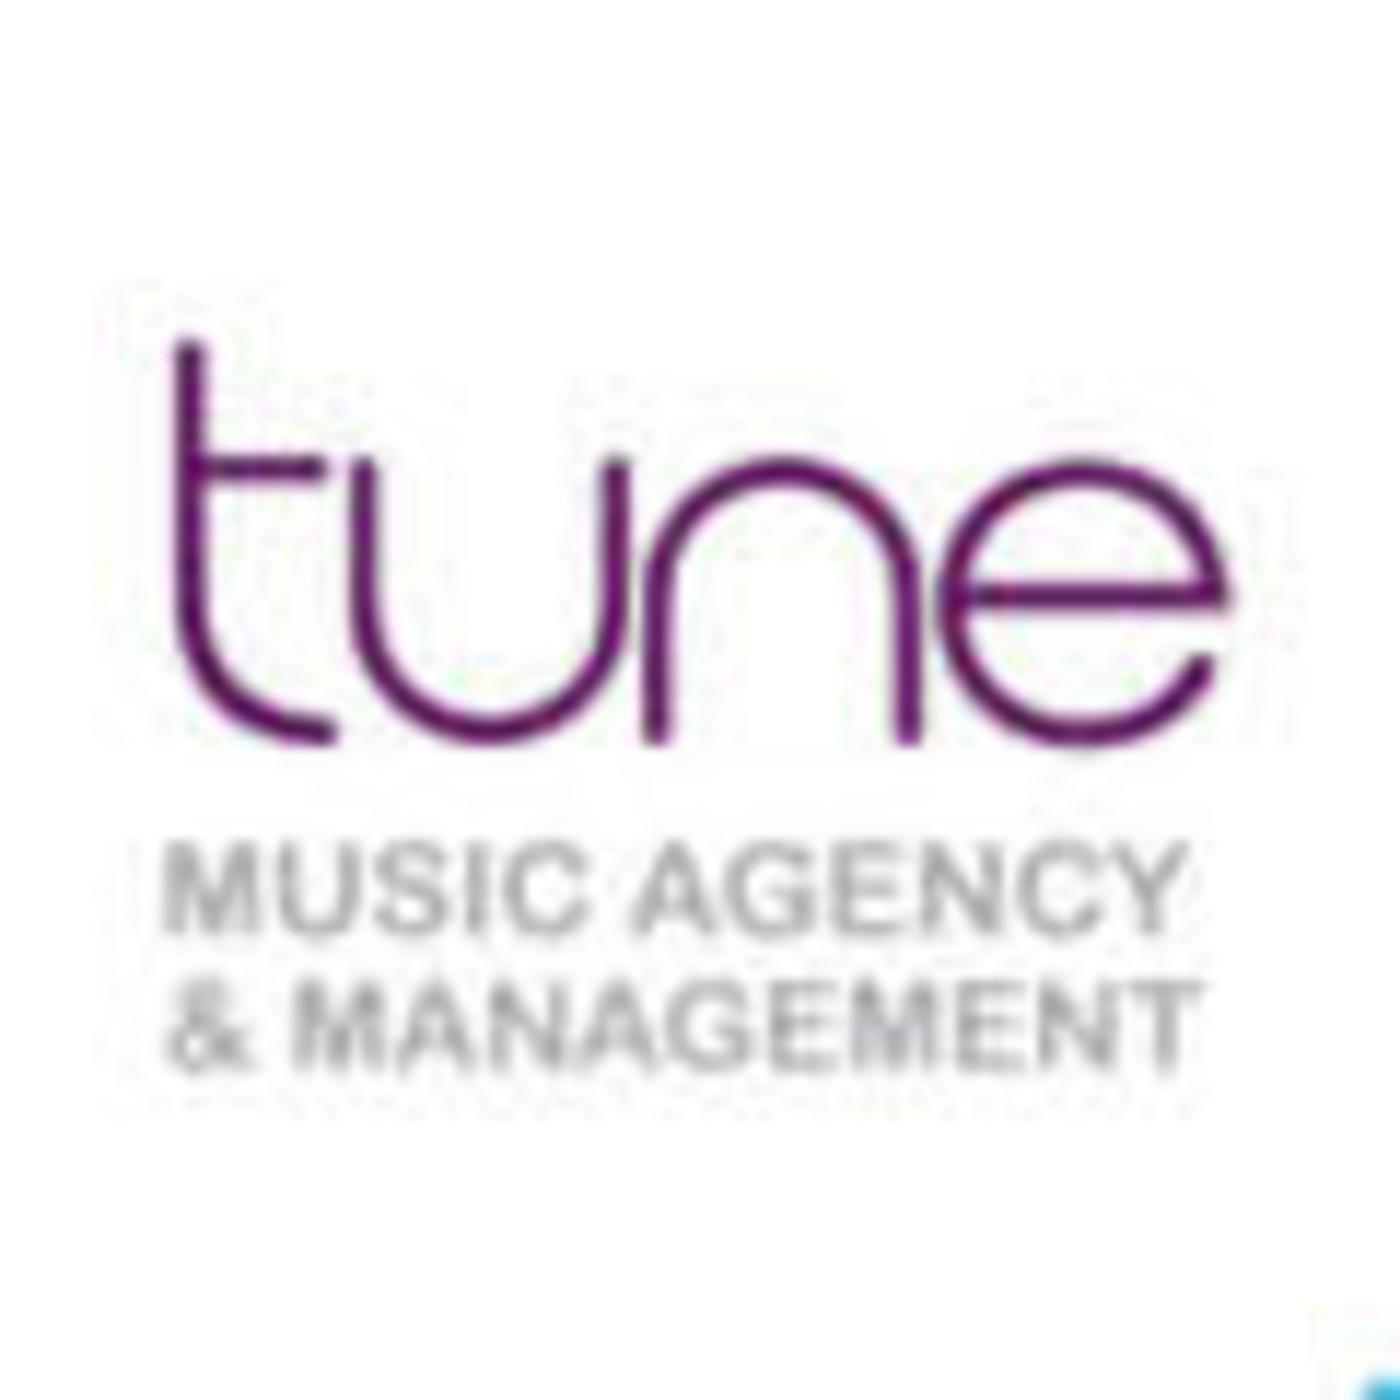 Tune Agency